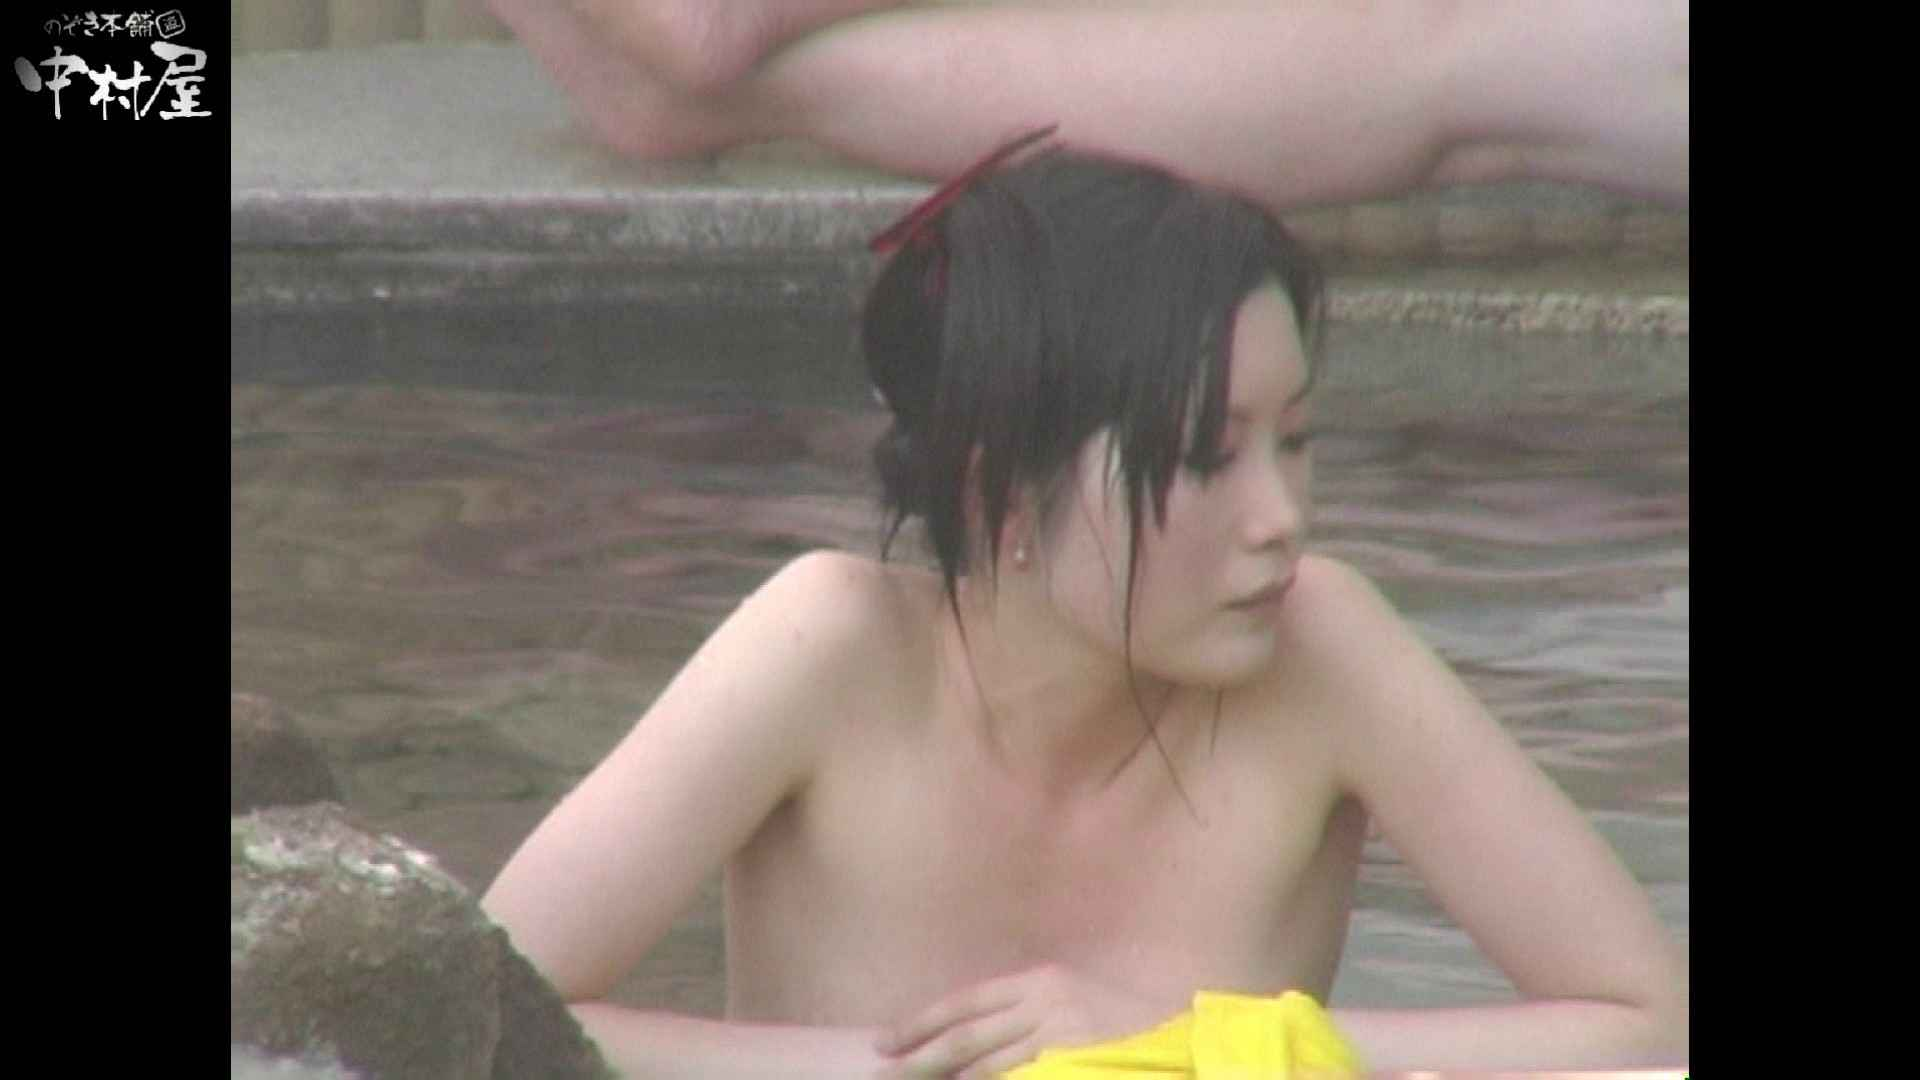 Aquaな露天風呂Vol.940 盗撮  47連発 31